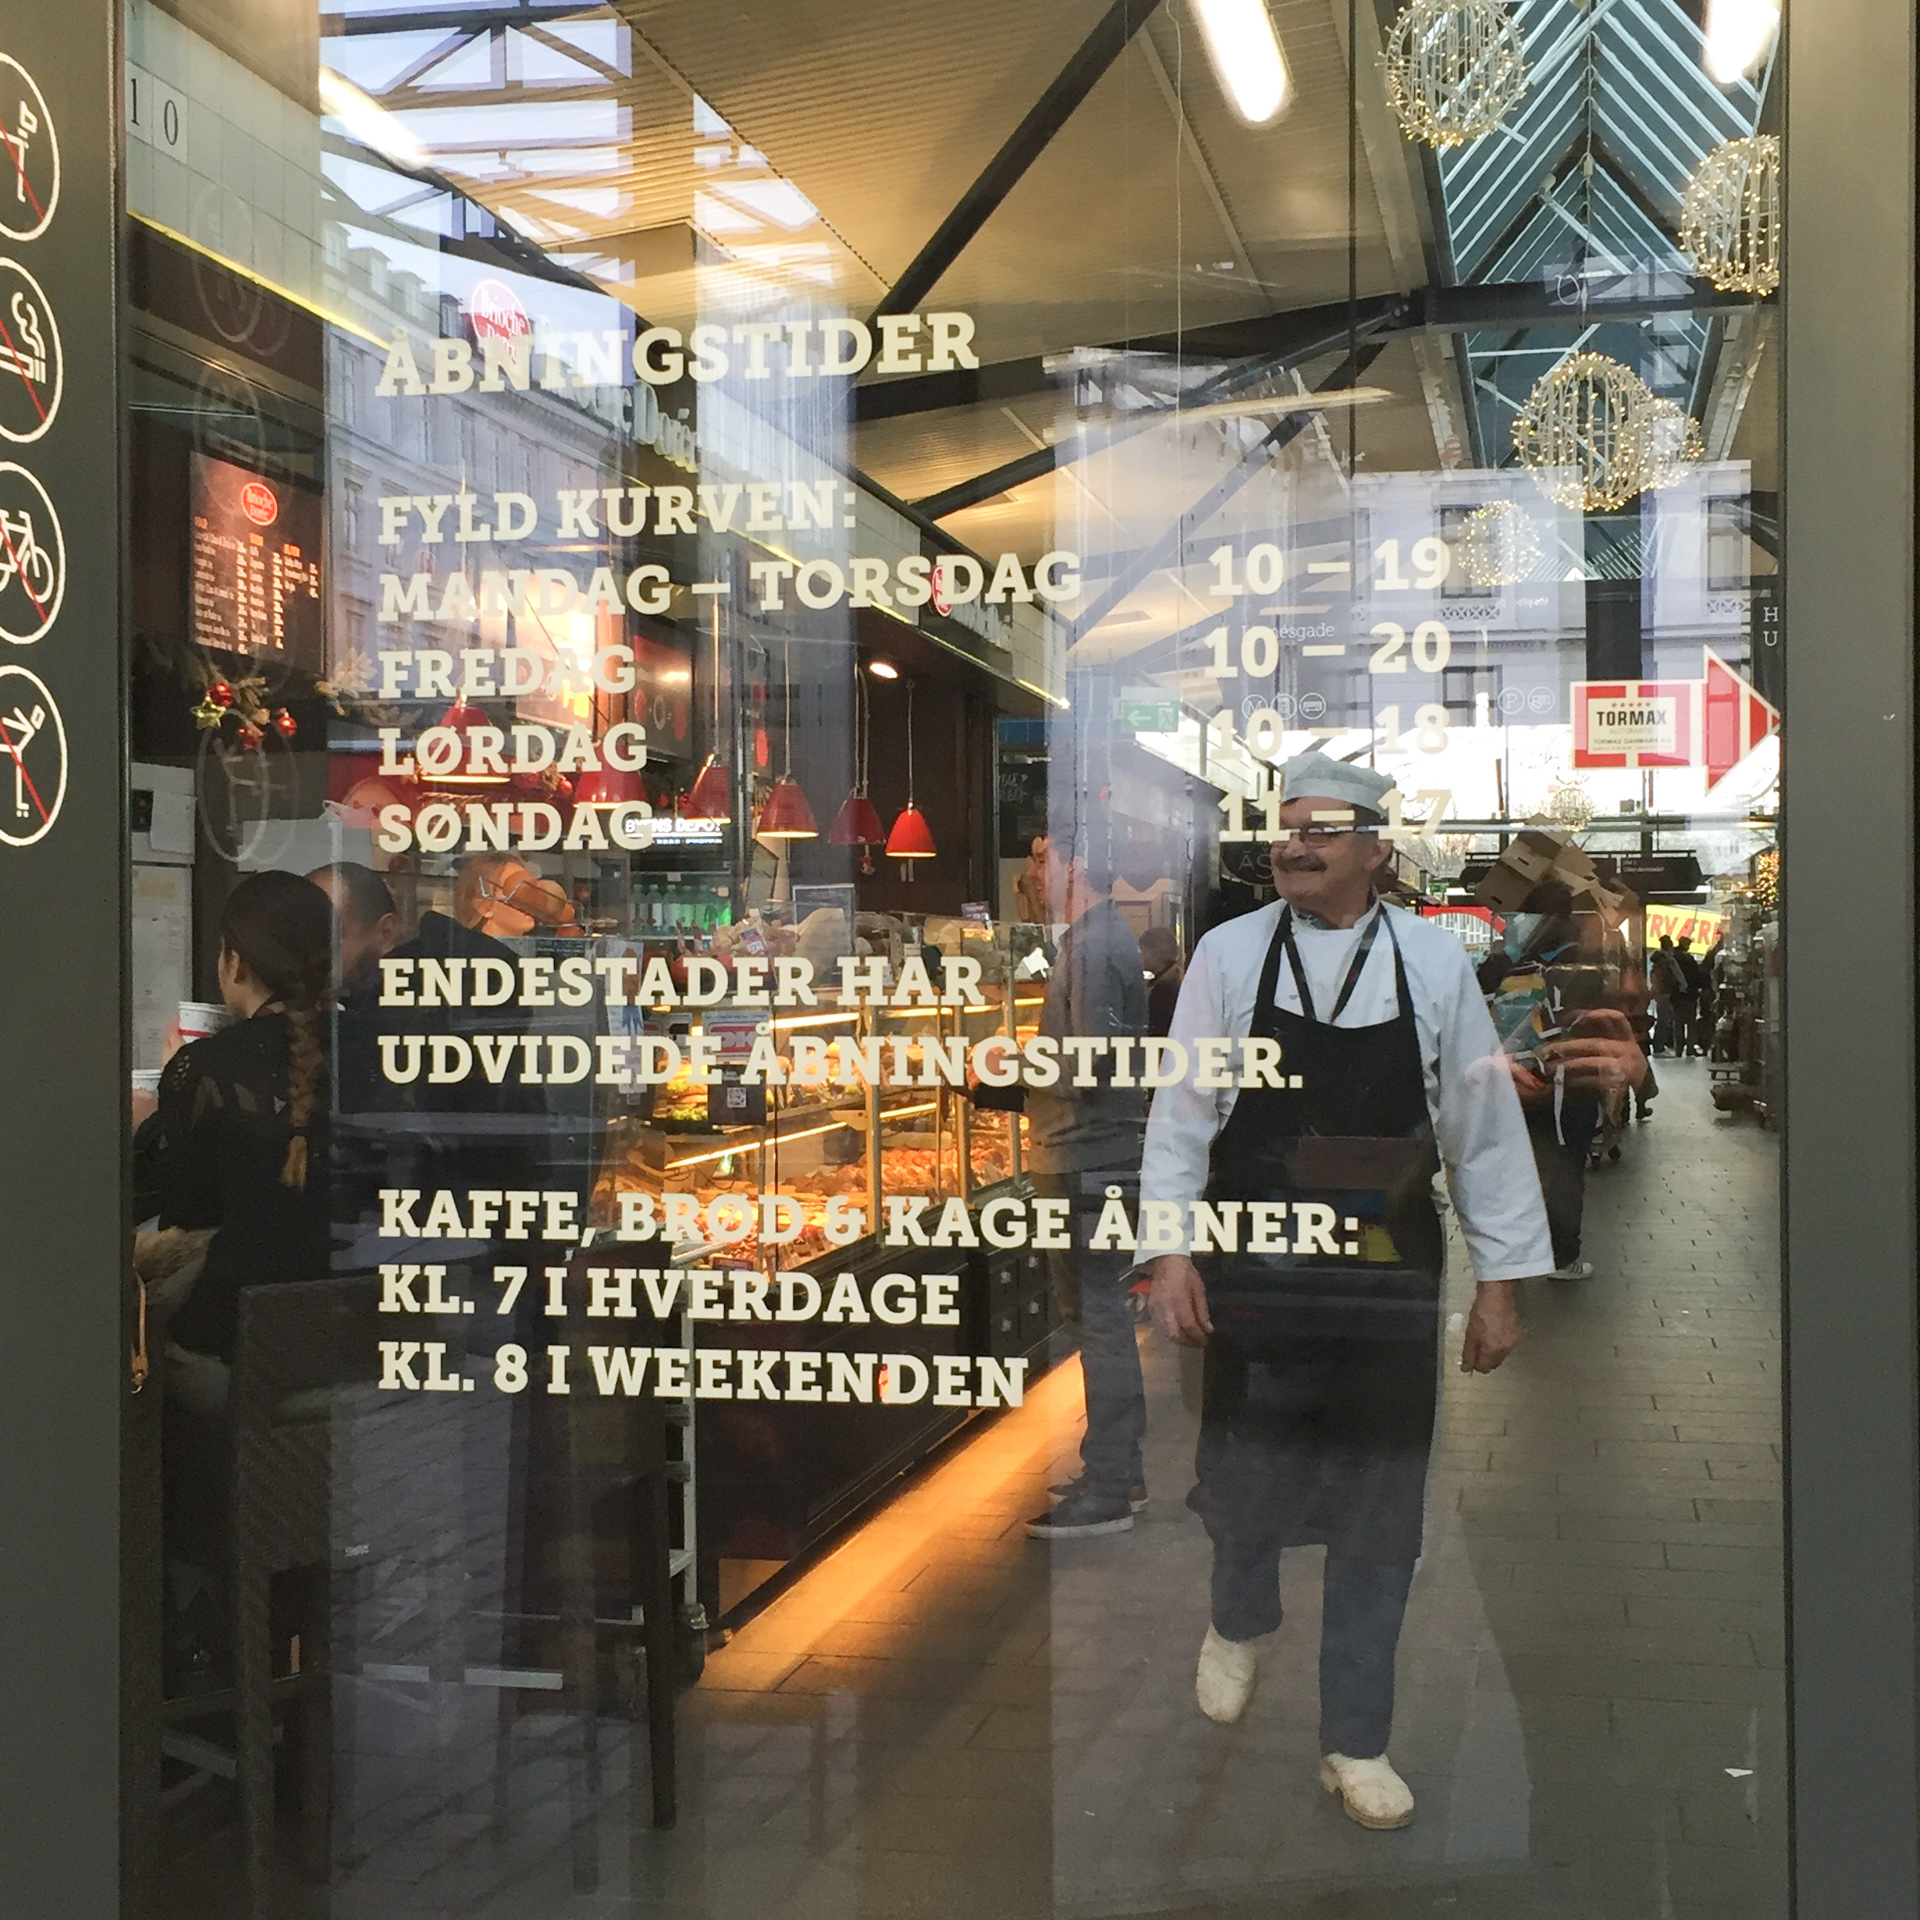 Where to Find the Best Coffee in Copenhagen